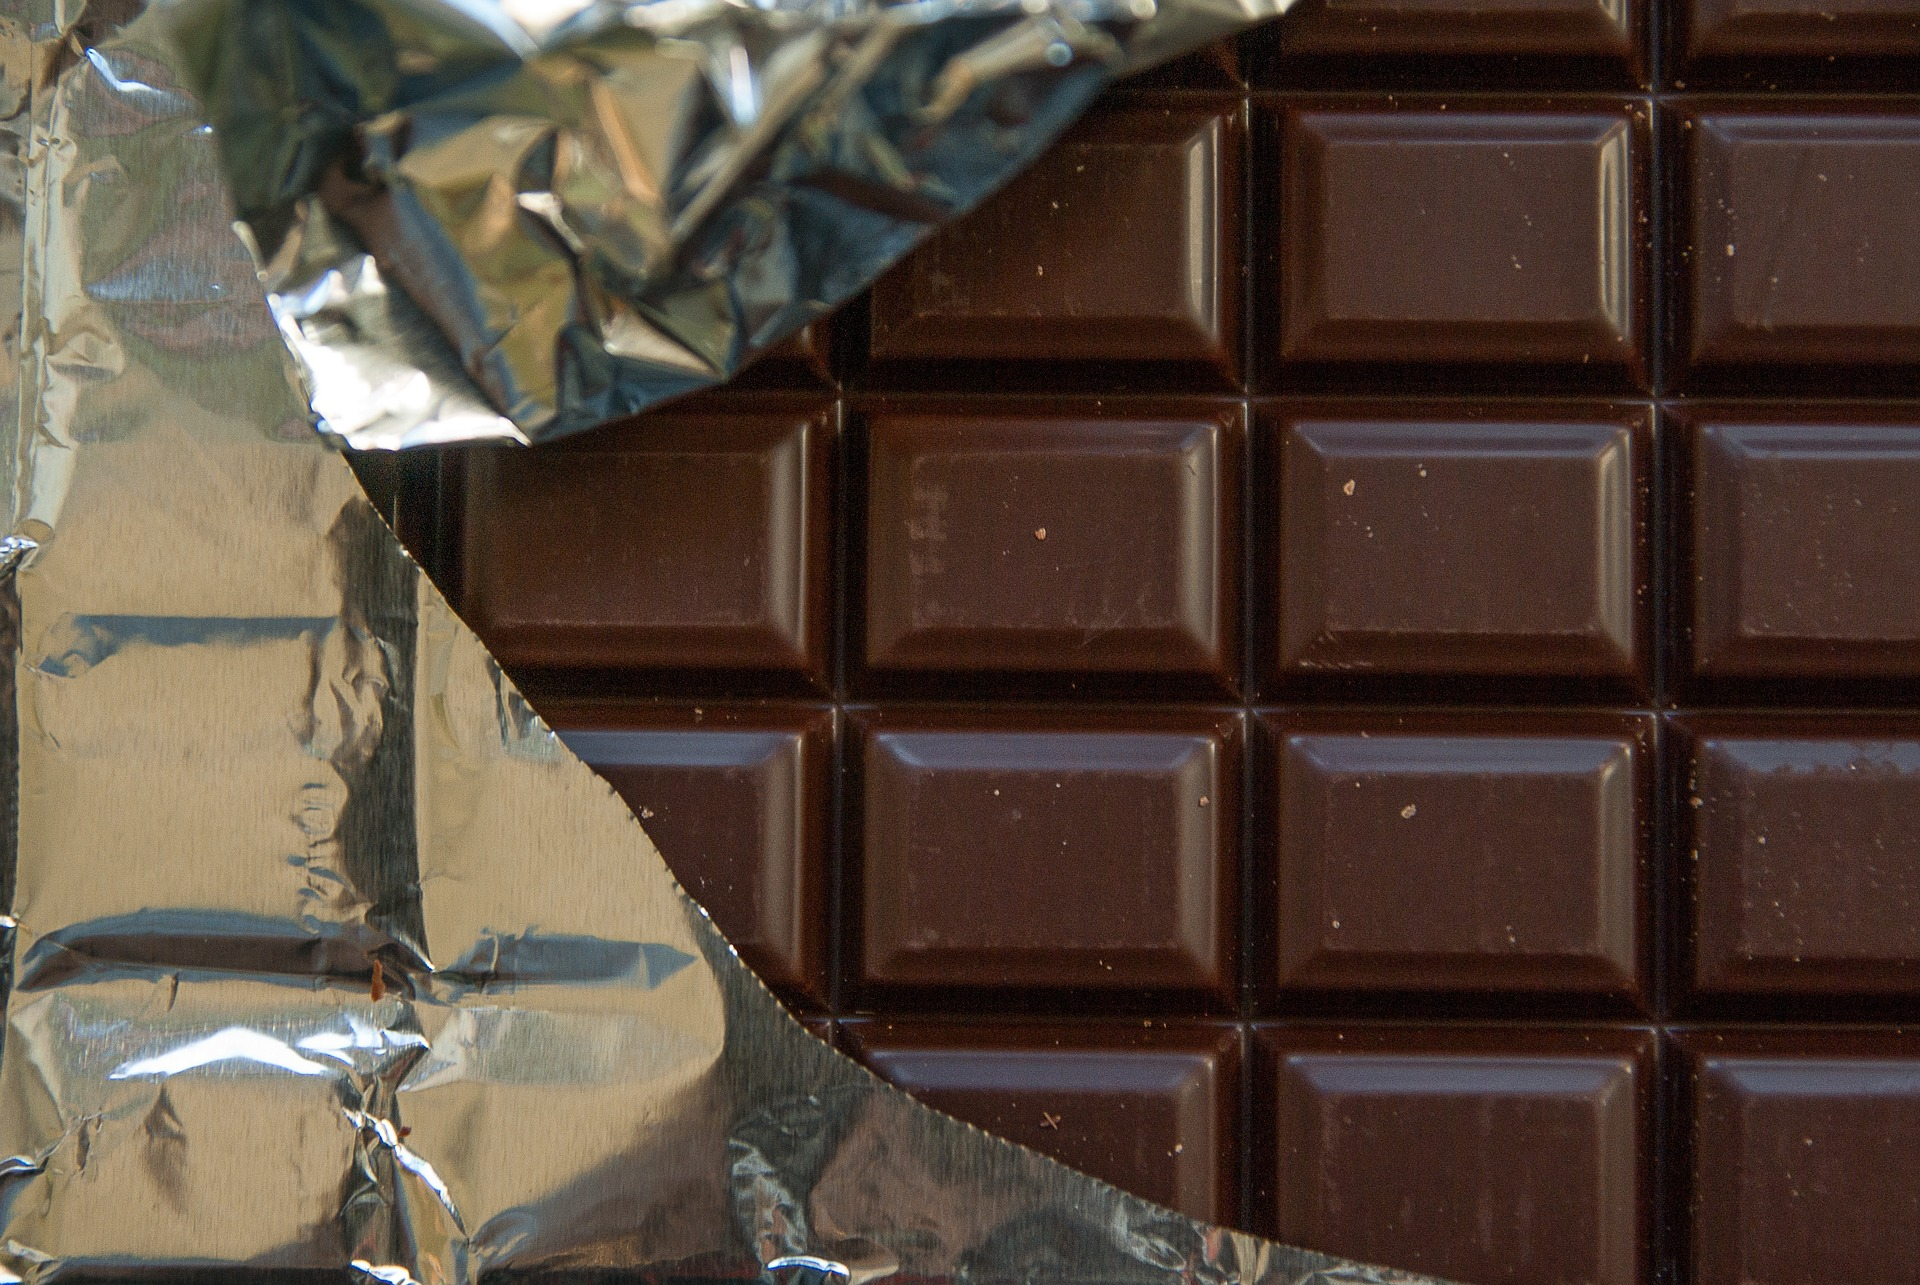 dark chocolate for PMS